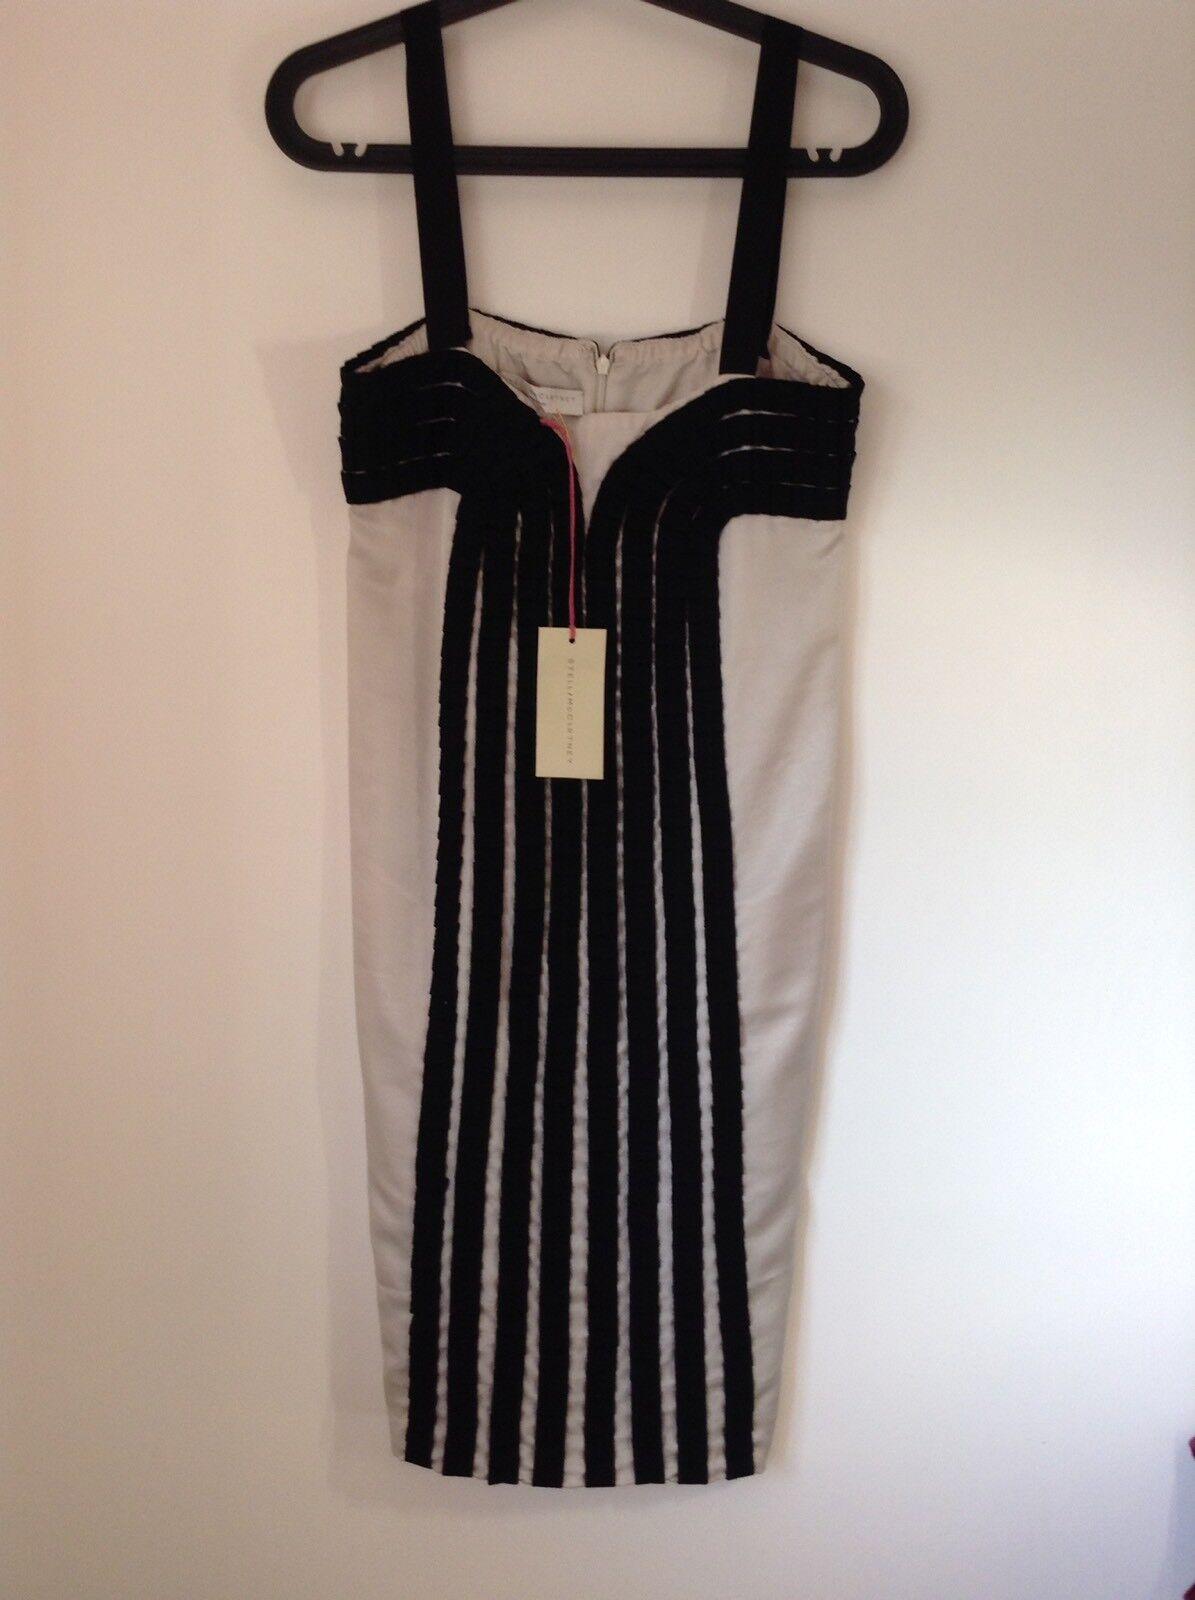 BNWT 100% Auth Stella McCartney Ladies Luxury Dress. Dress. Dress. 40 8982be